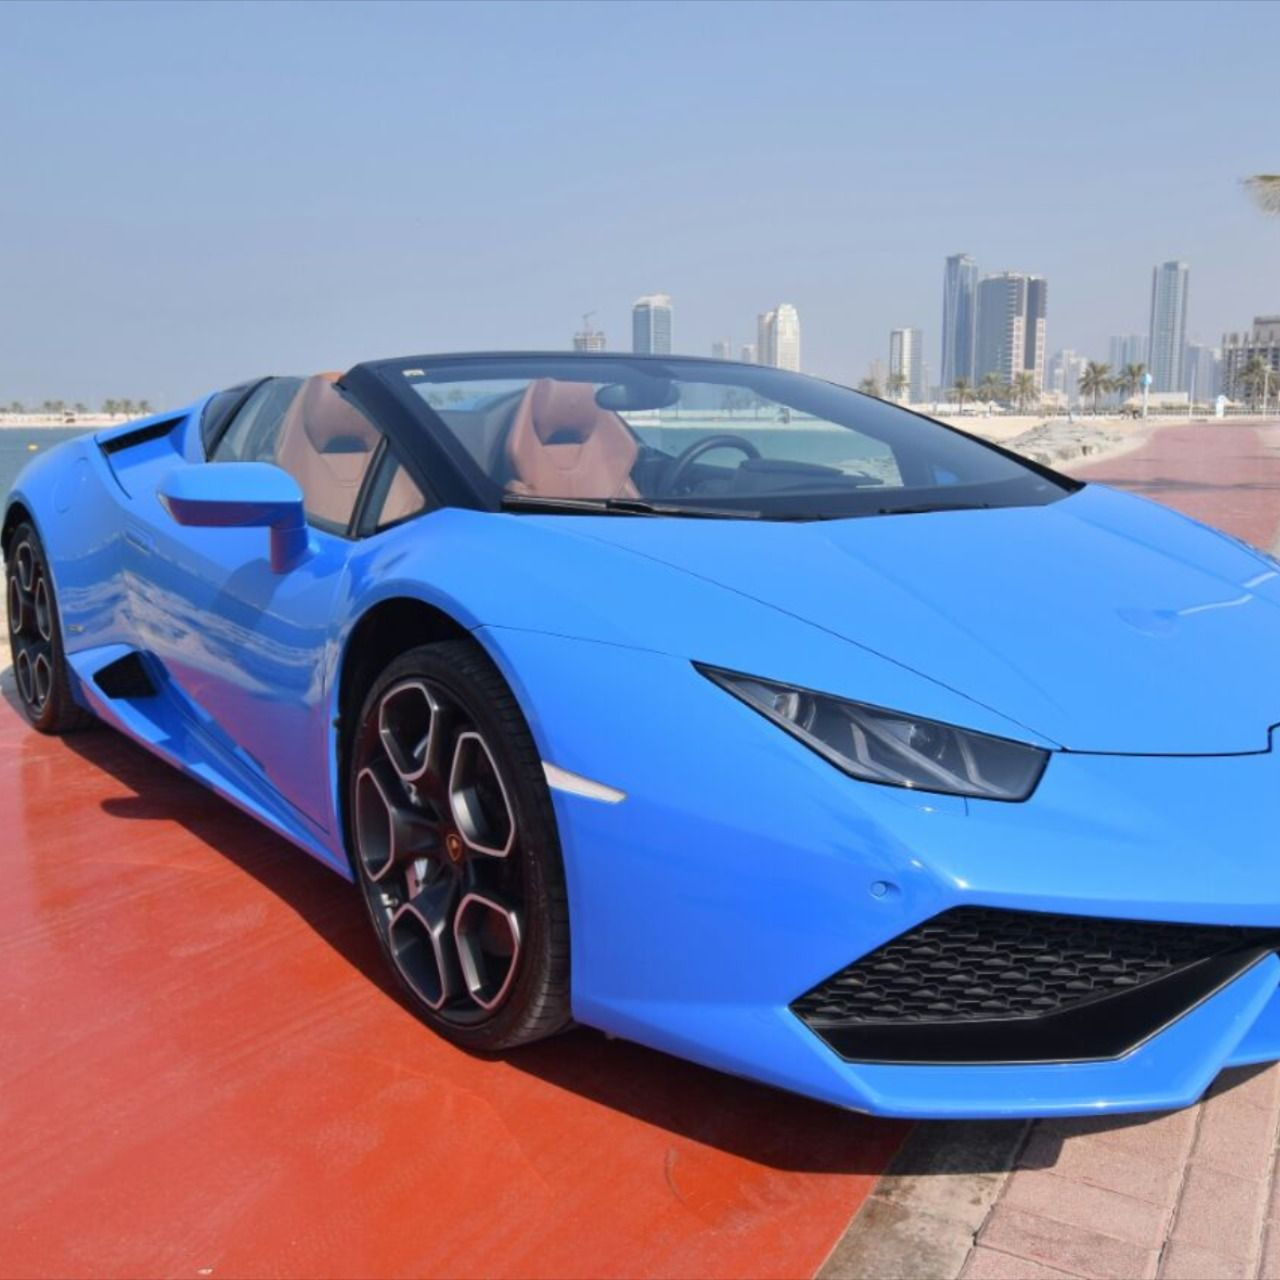 Lamborghini Huracan Spyder Rental In Dubai In 2020 Cool Sports Cars Luxury Car Rental Sports Cars Luxury